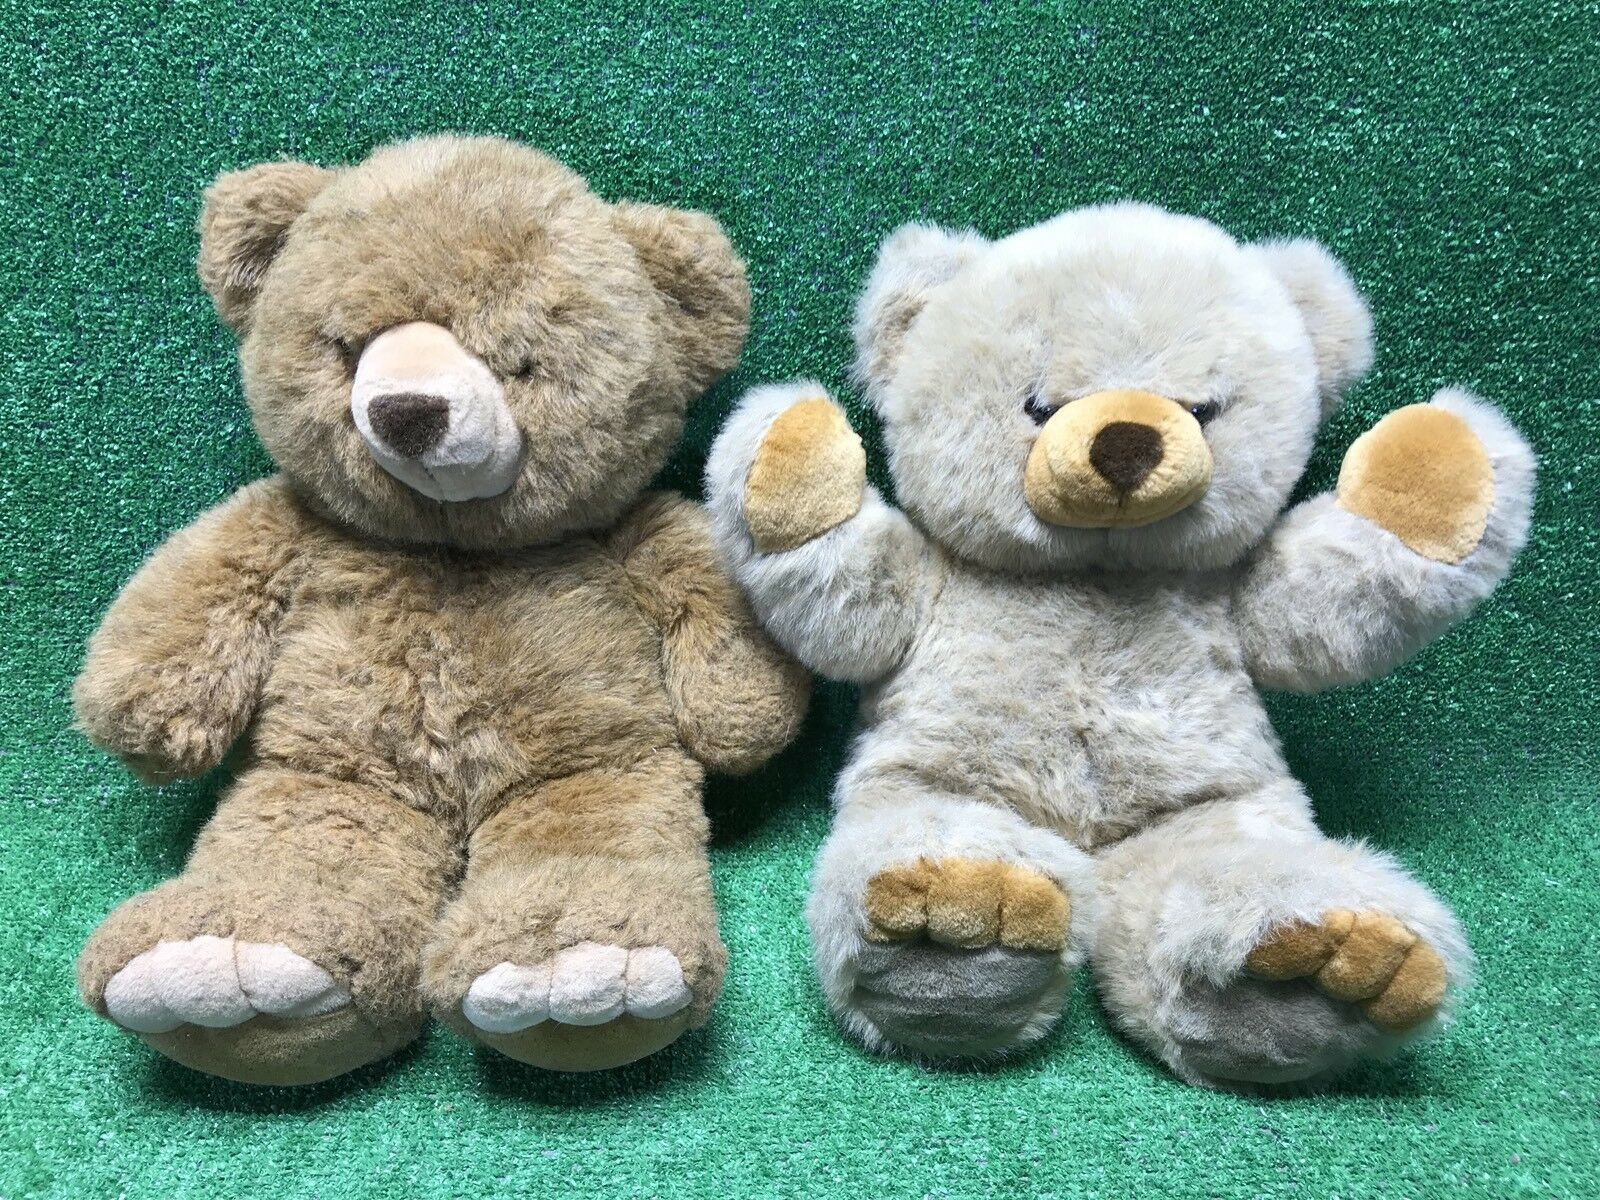 2 Rare VTG JC Penney 1994 Plush Jumbo 24  Brown Teddy Bear Collectible Large